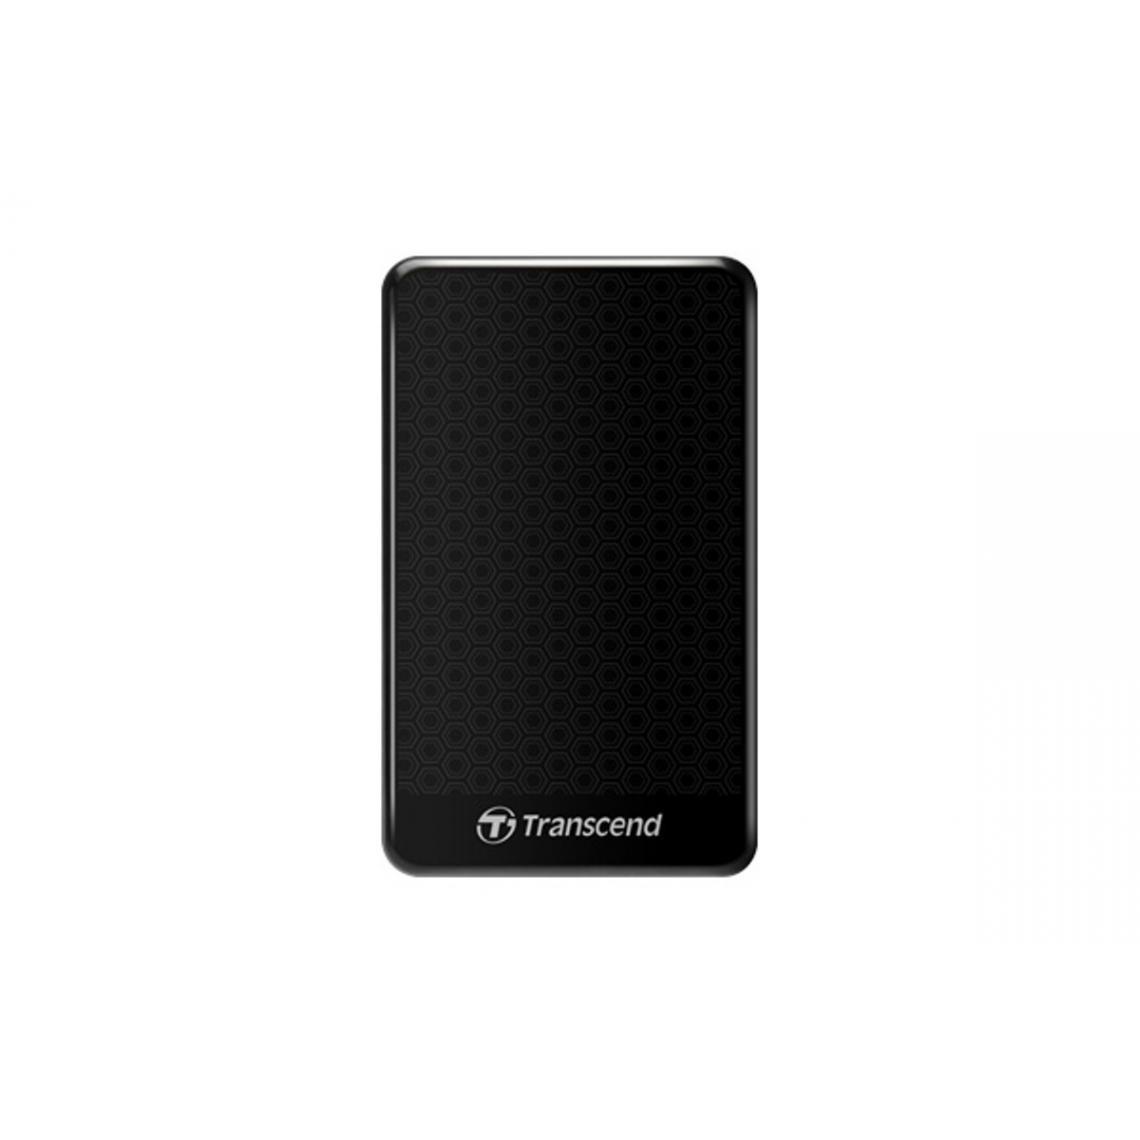 "Transcend StoreJet 1 To - 2.5"" USB 3.0"